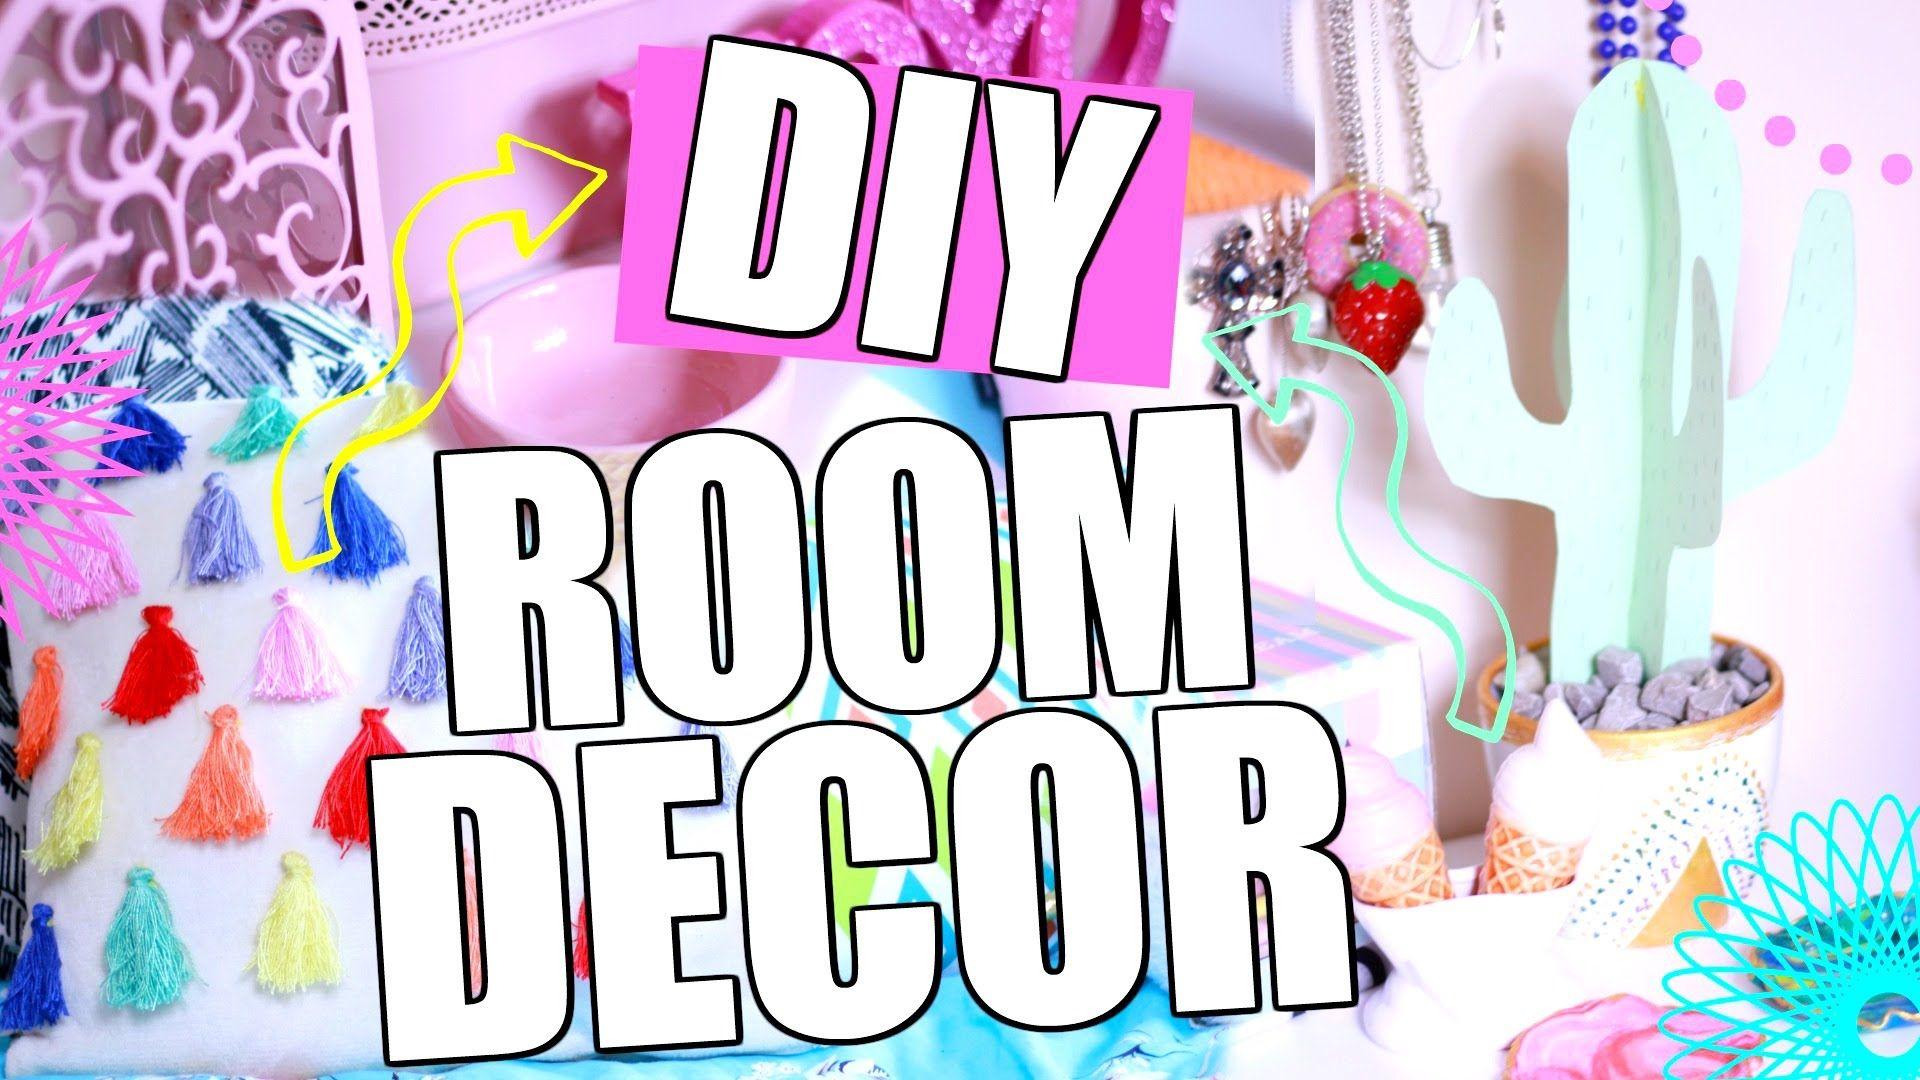 Dekoracje Do Pokoju Diy Inspirowane Tumblr Diy Room Decor Tumbr